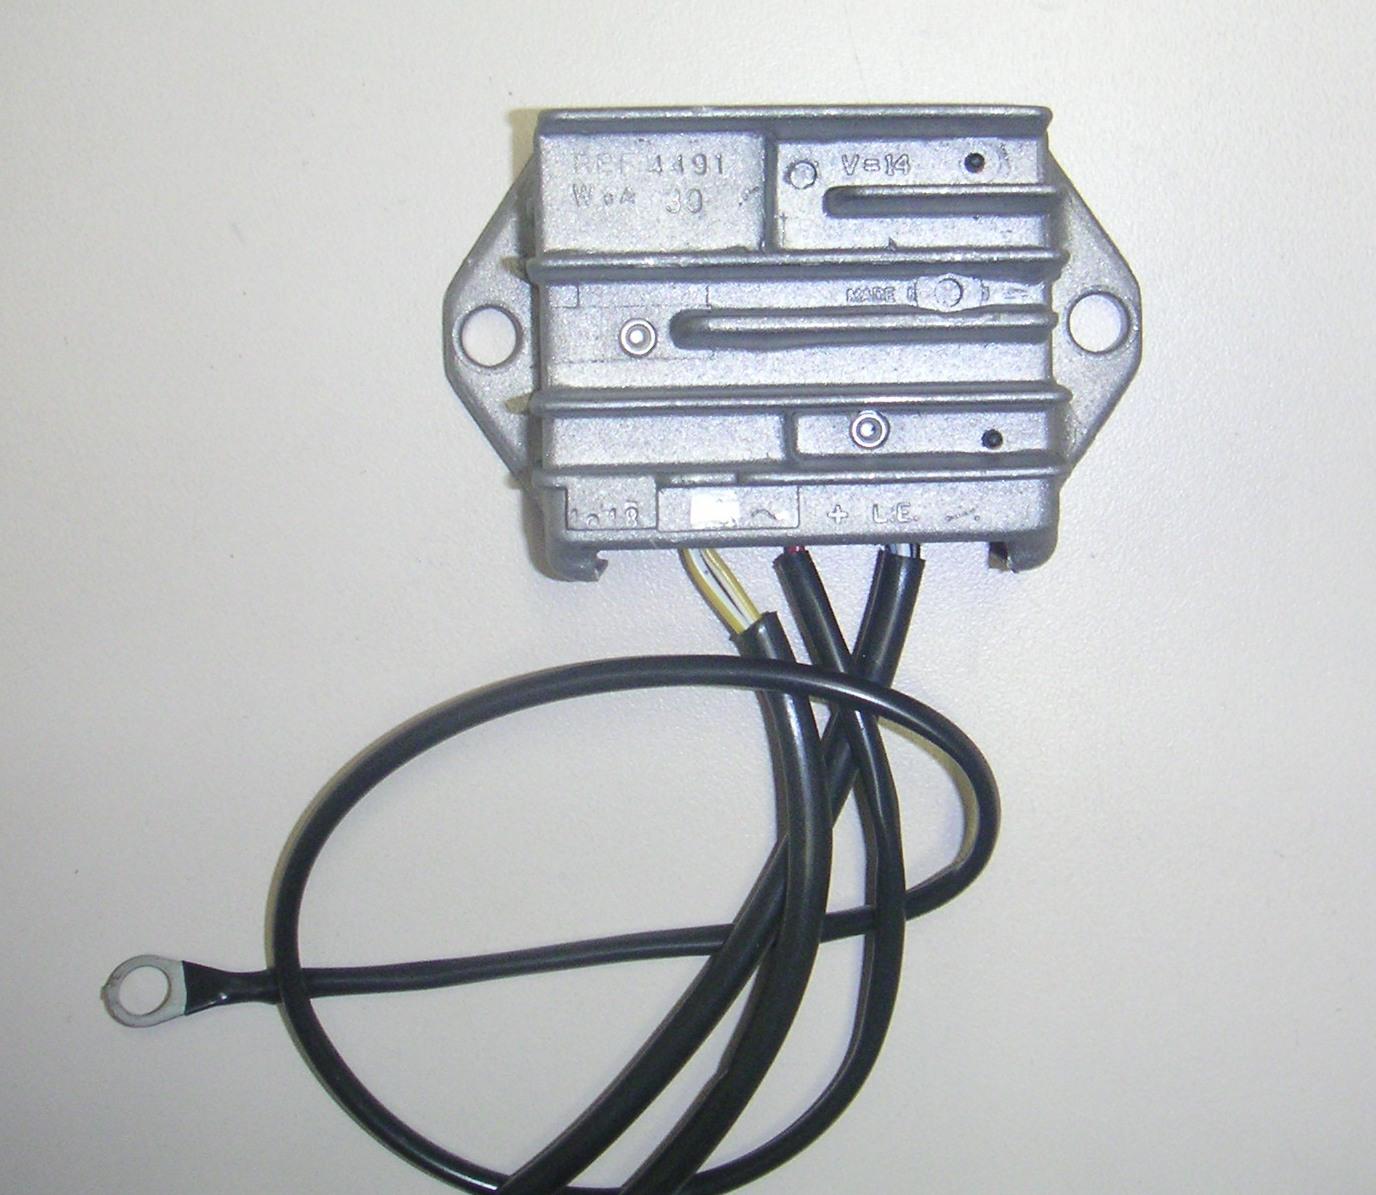 Regulateur 12V 30A HATZ 1D30 1D41 1D50 1D60 1D80 1D90 HATZ 02312500 ex 01248123 - SAPRISA 4491